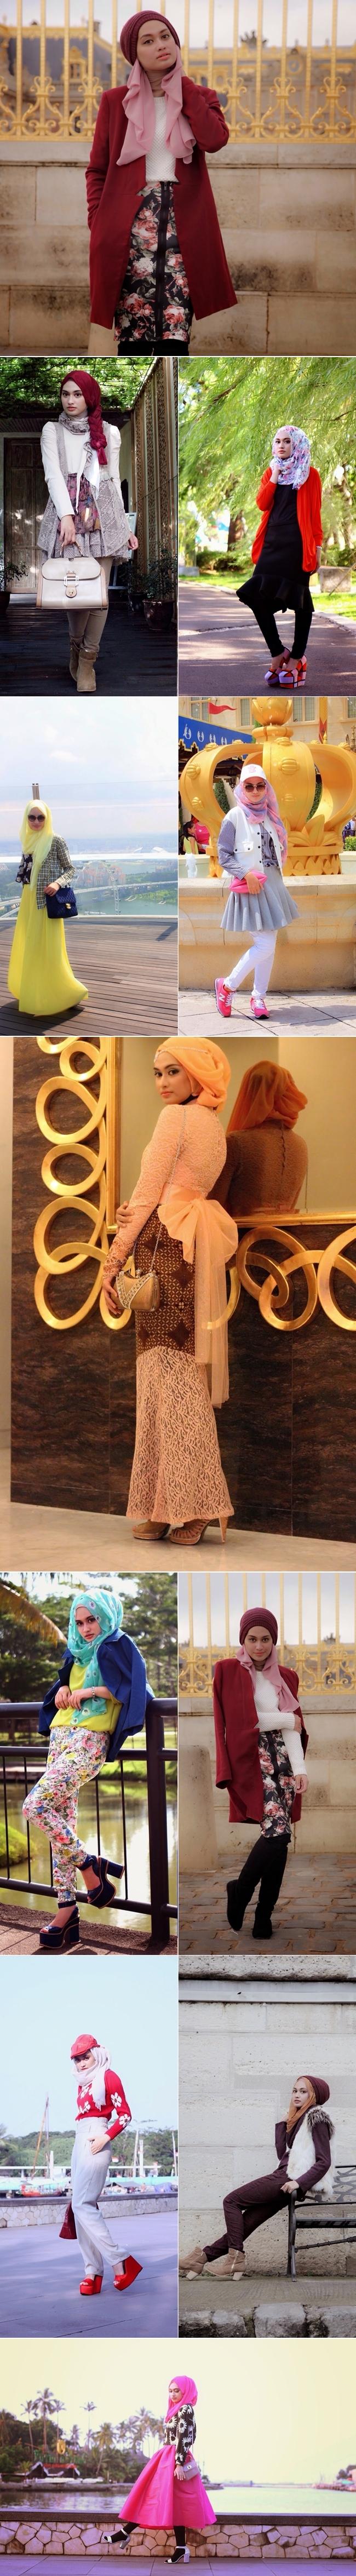 shella alaztha, headscarf, covered style, hijab style, Muslim fashion, herfashion, style crush, Indonesia